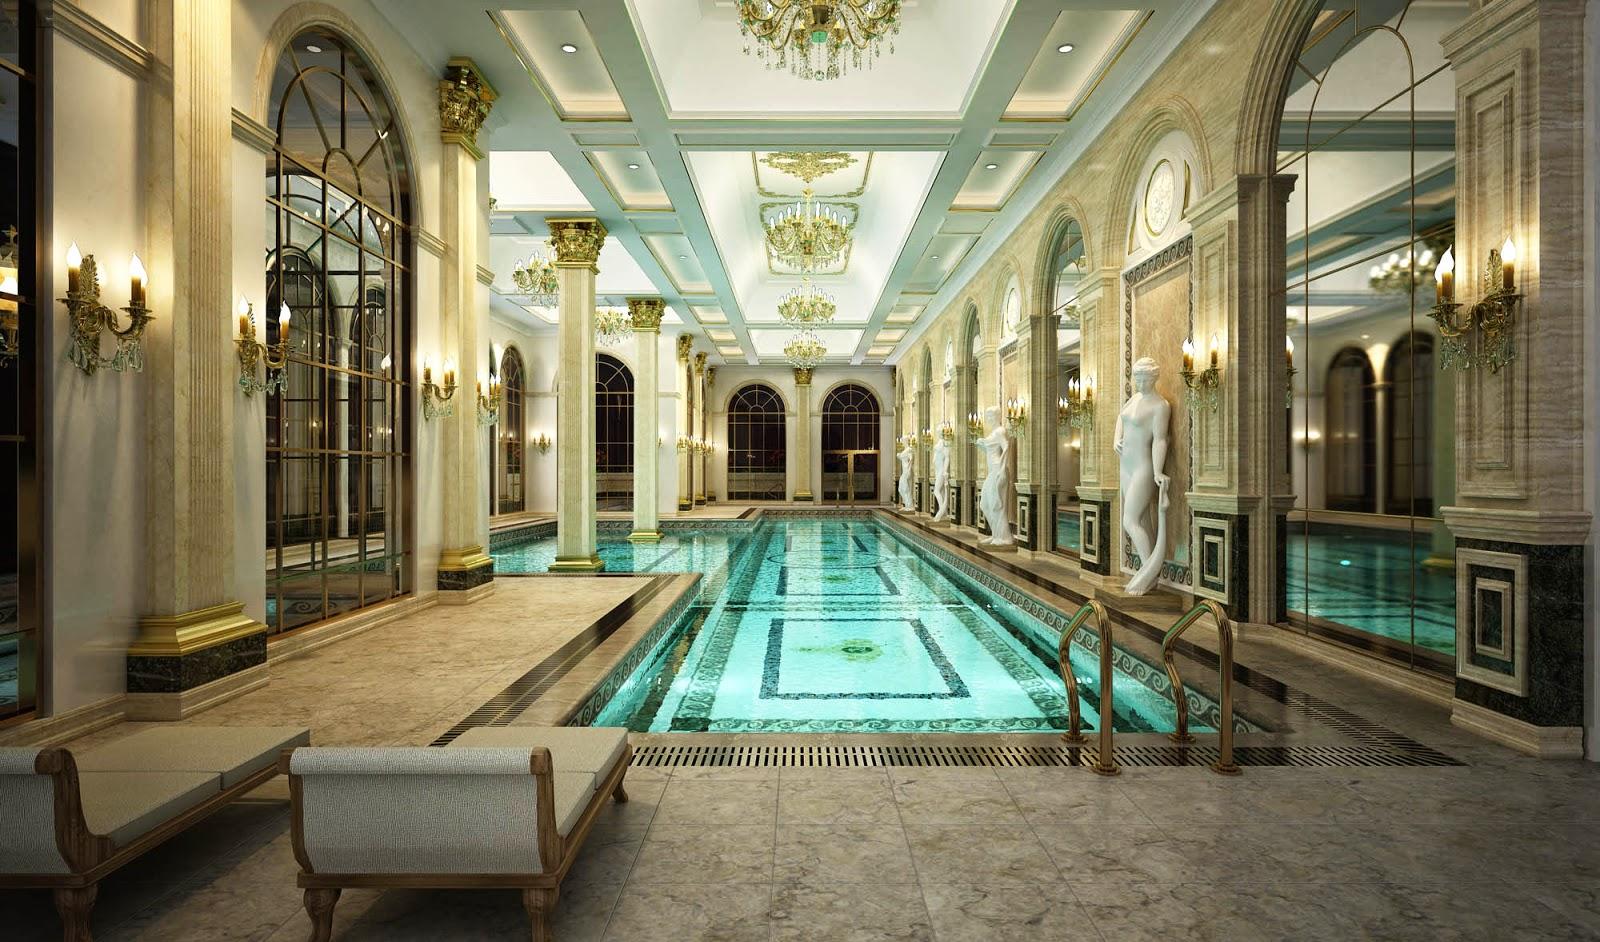 Hồ bơi trong nhà của D'.Palais de Louis